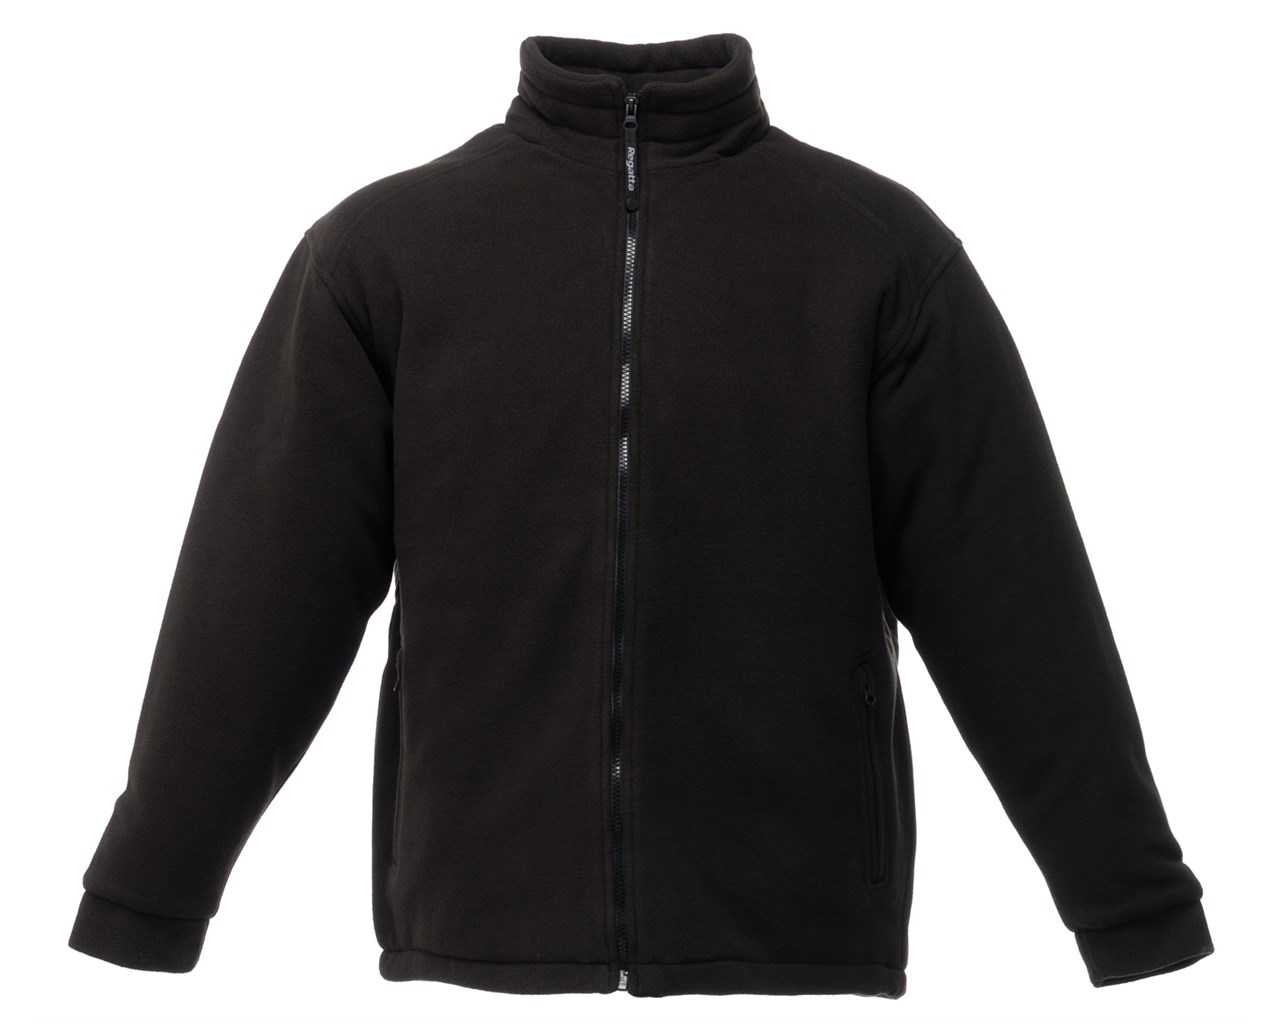 Regatta Asgard II Fleece Jacket w/ front zip pockets